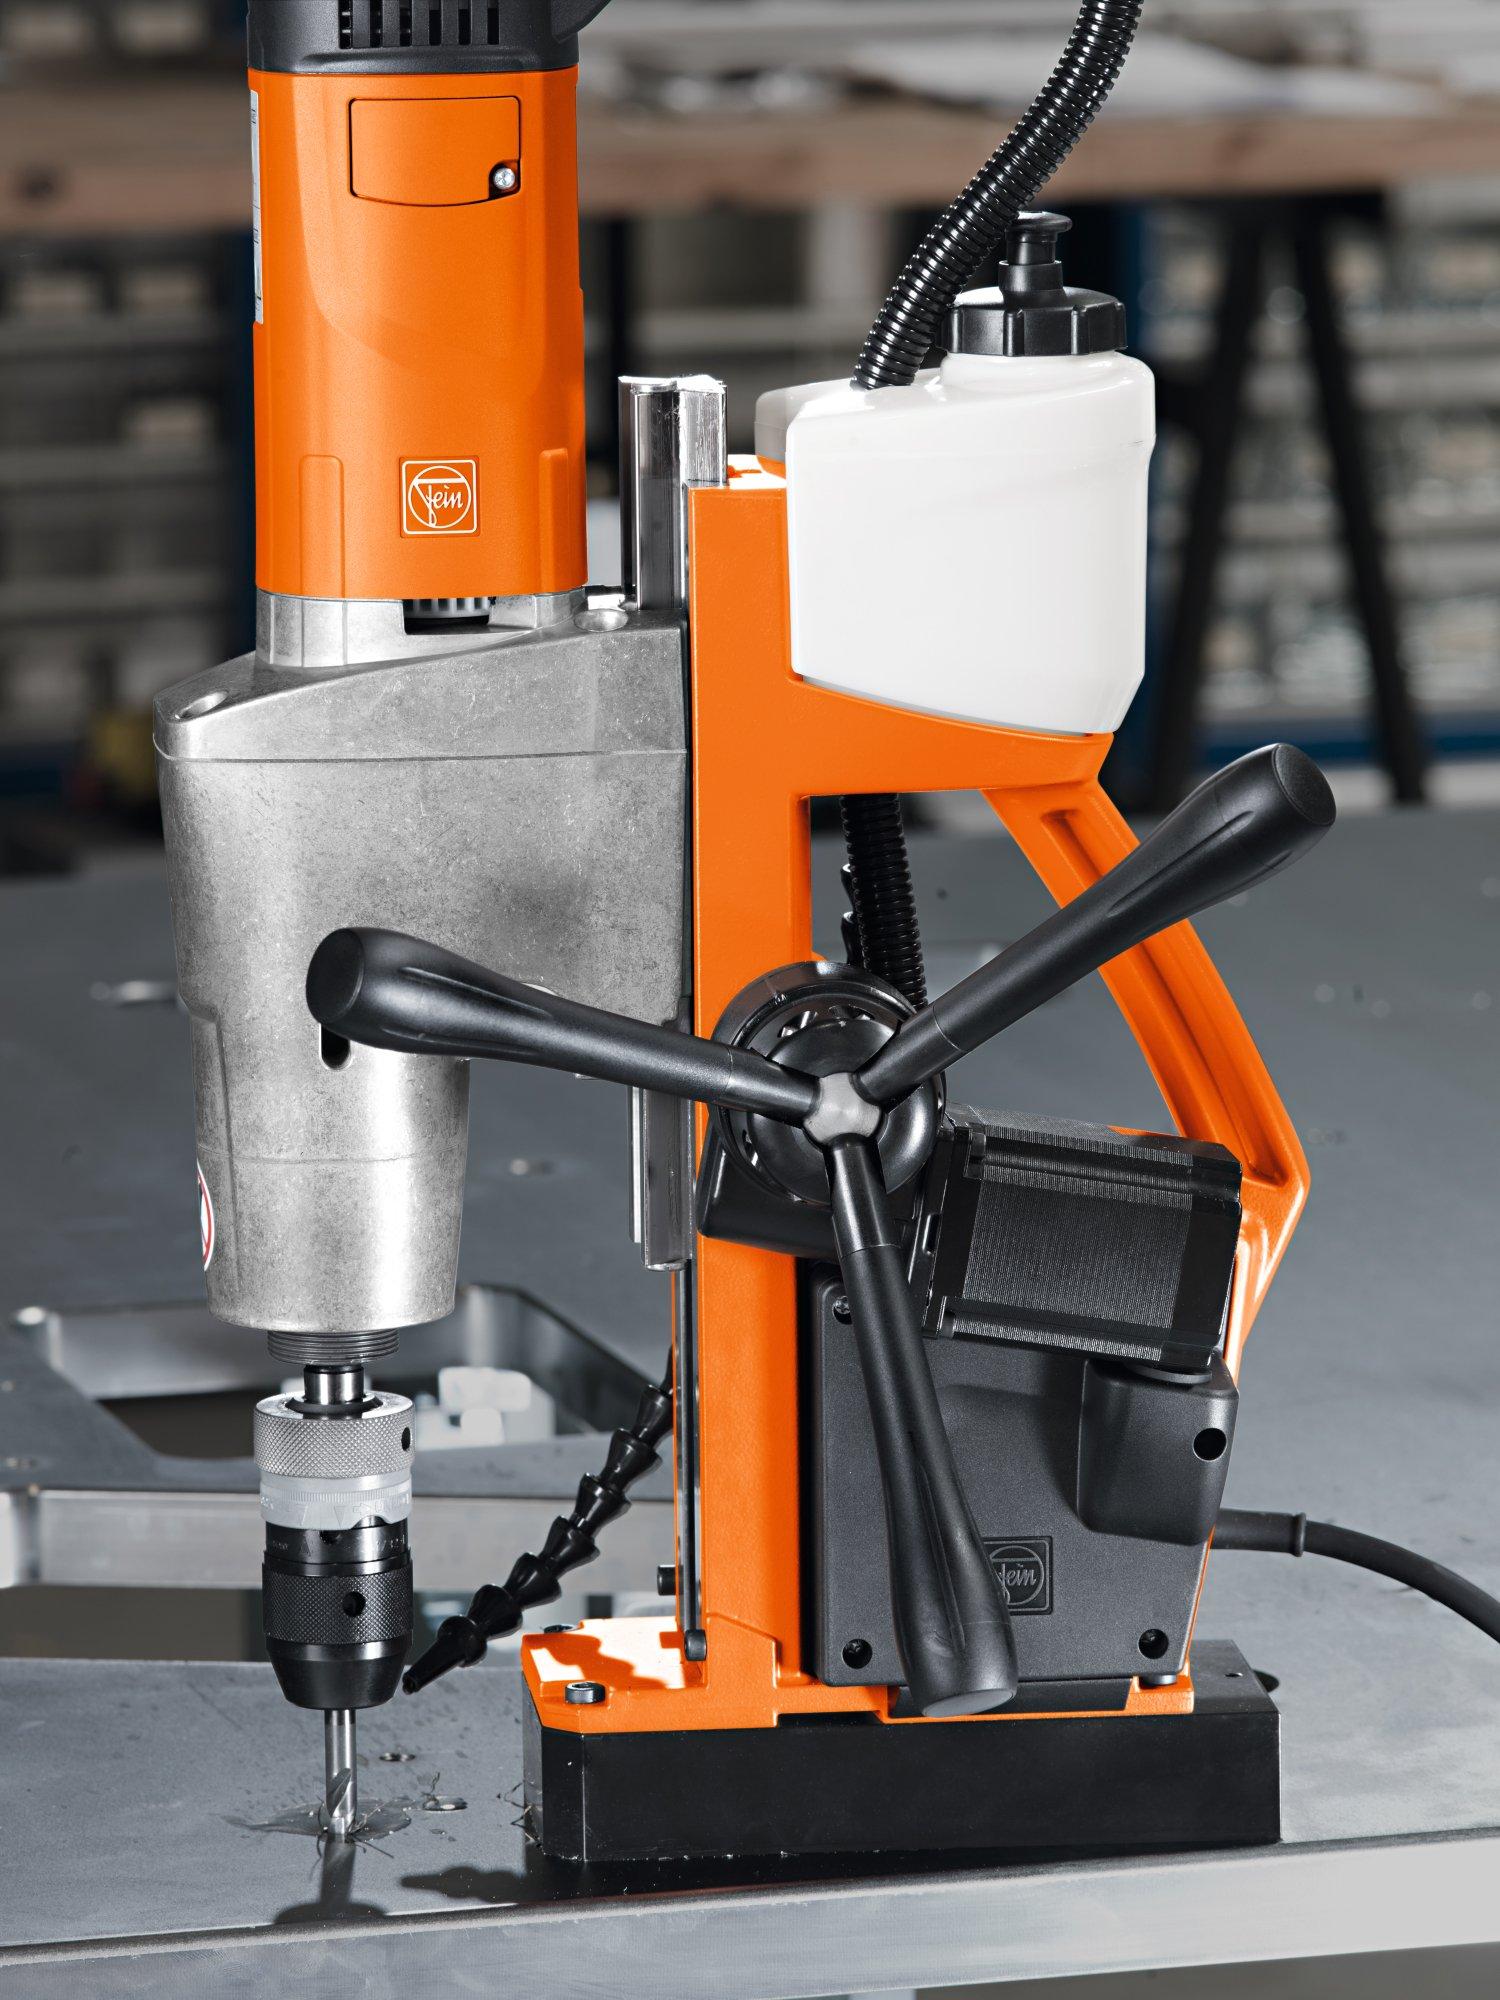 Fein-Magnet-Kernbohrmaschine-KBM-50-auto-bis-50-mm-1200-W-240-V